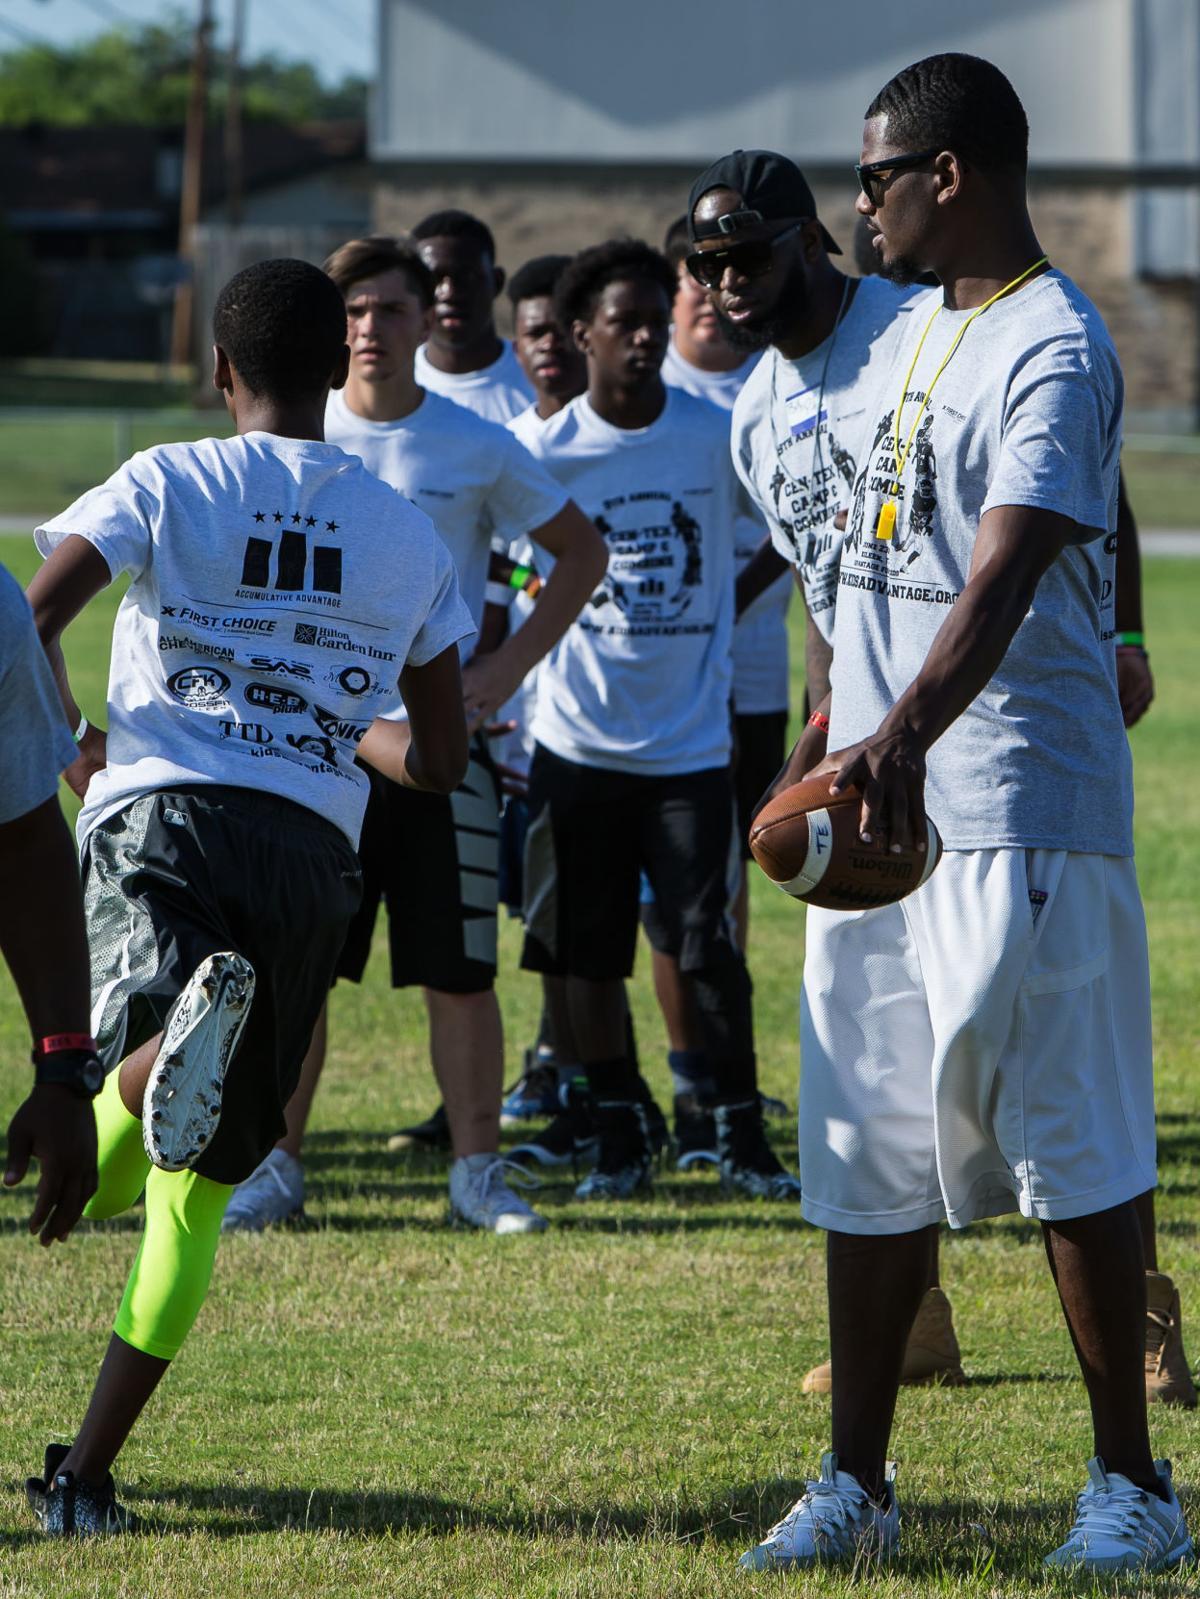 180623-Football Camp